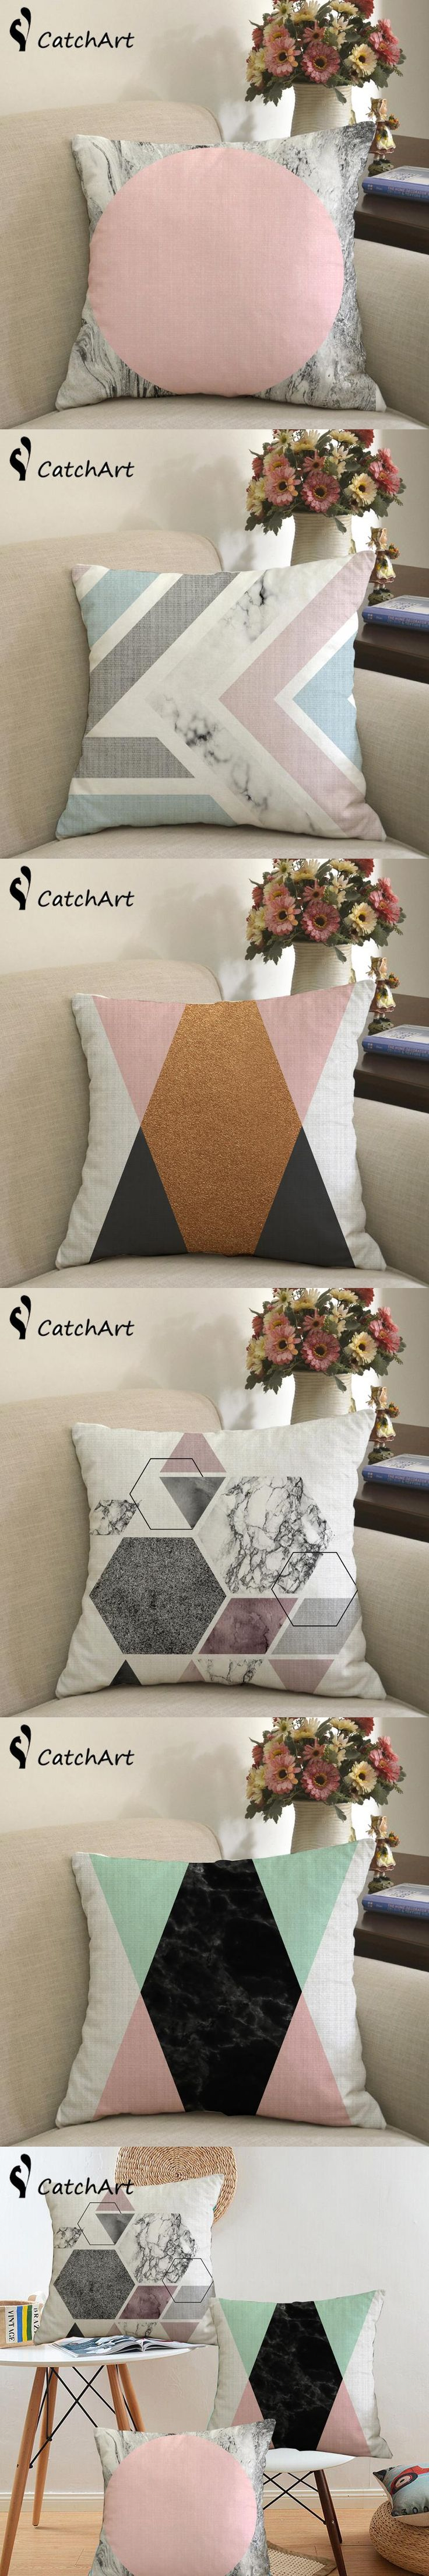 Nordic Retro Classical Geometry Art Cushion cover Abstract Plaid Lattice Pillows Linen Cotton Throw Pillow cover Custom Cushion